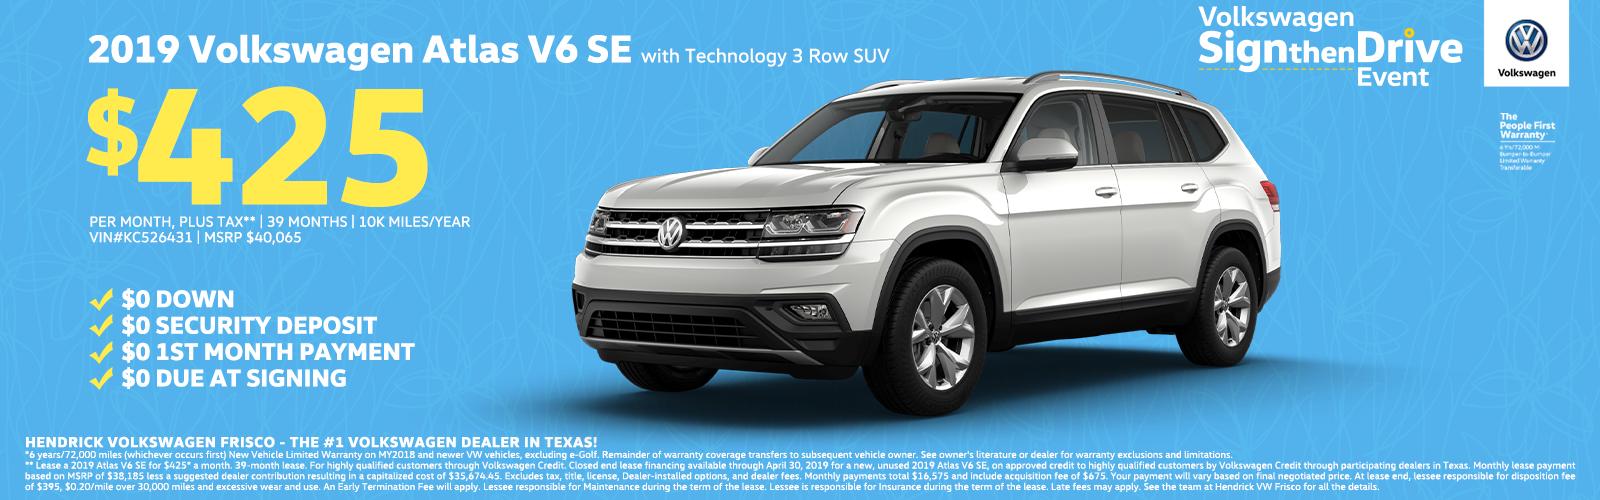 2019 Volkswagen Atlas V6 SE 3 Row SUV $425 Homepage